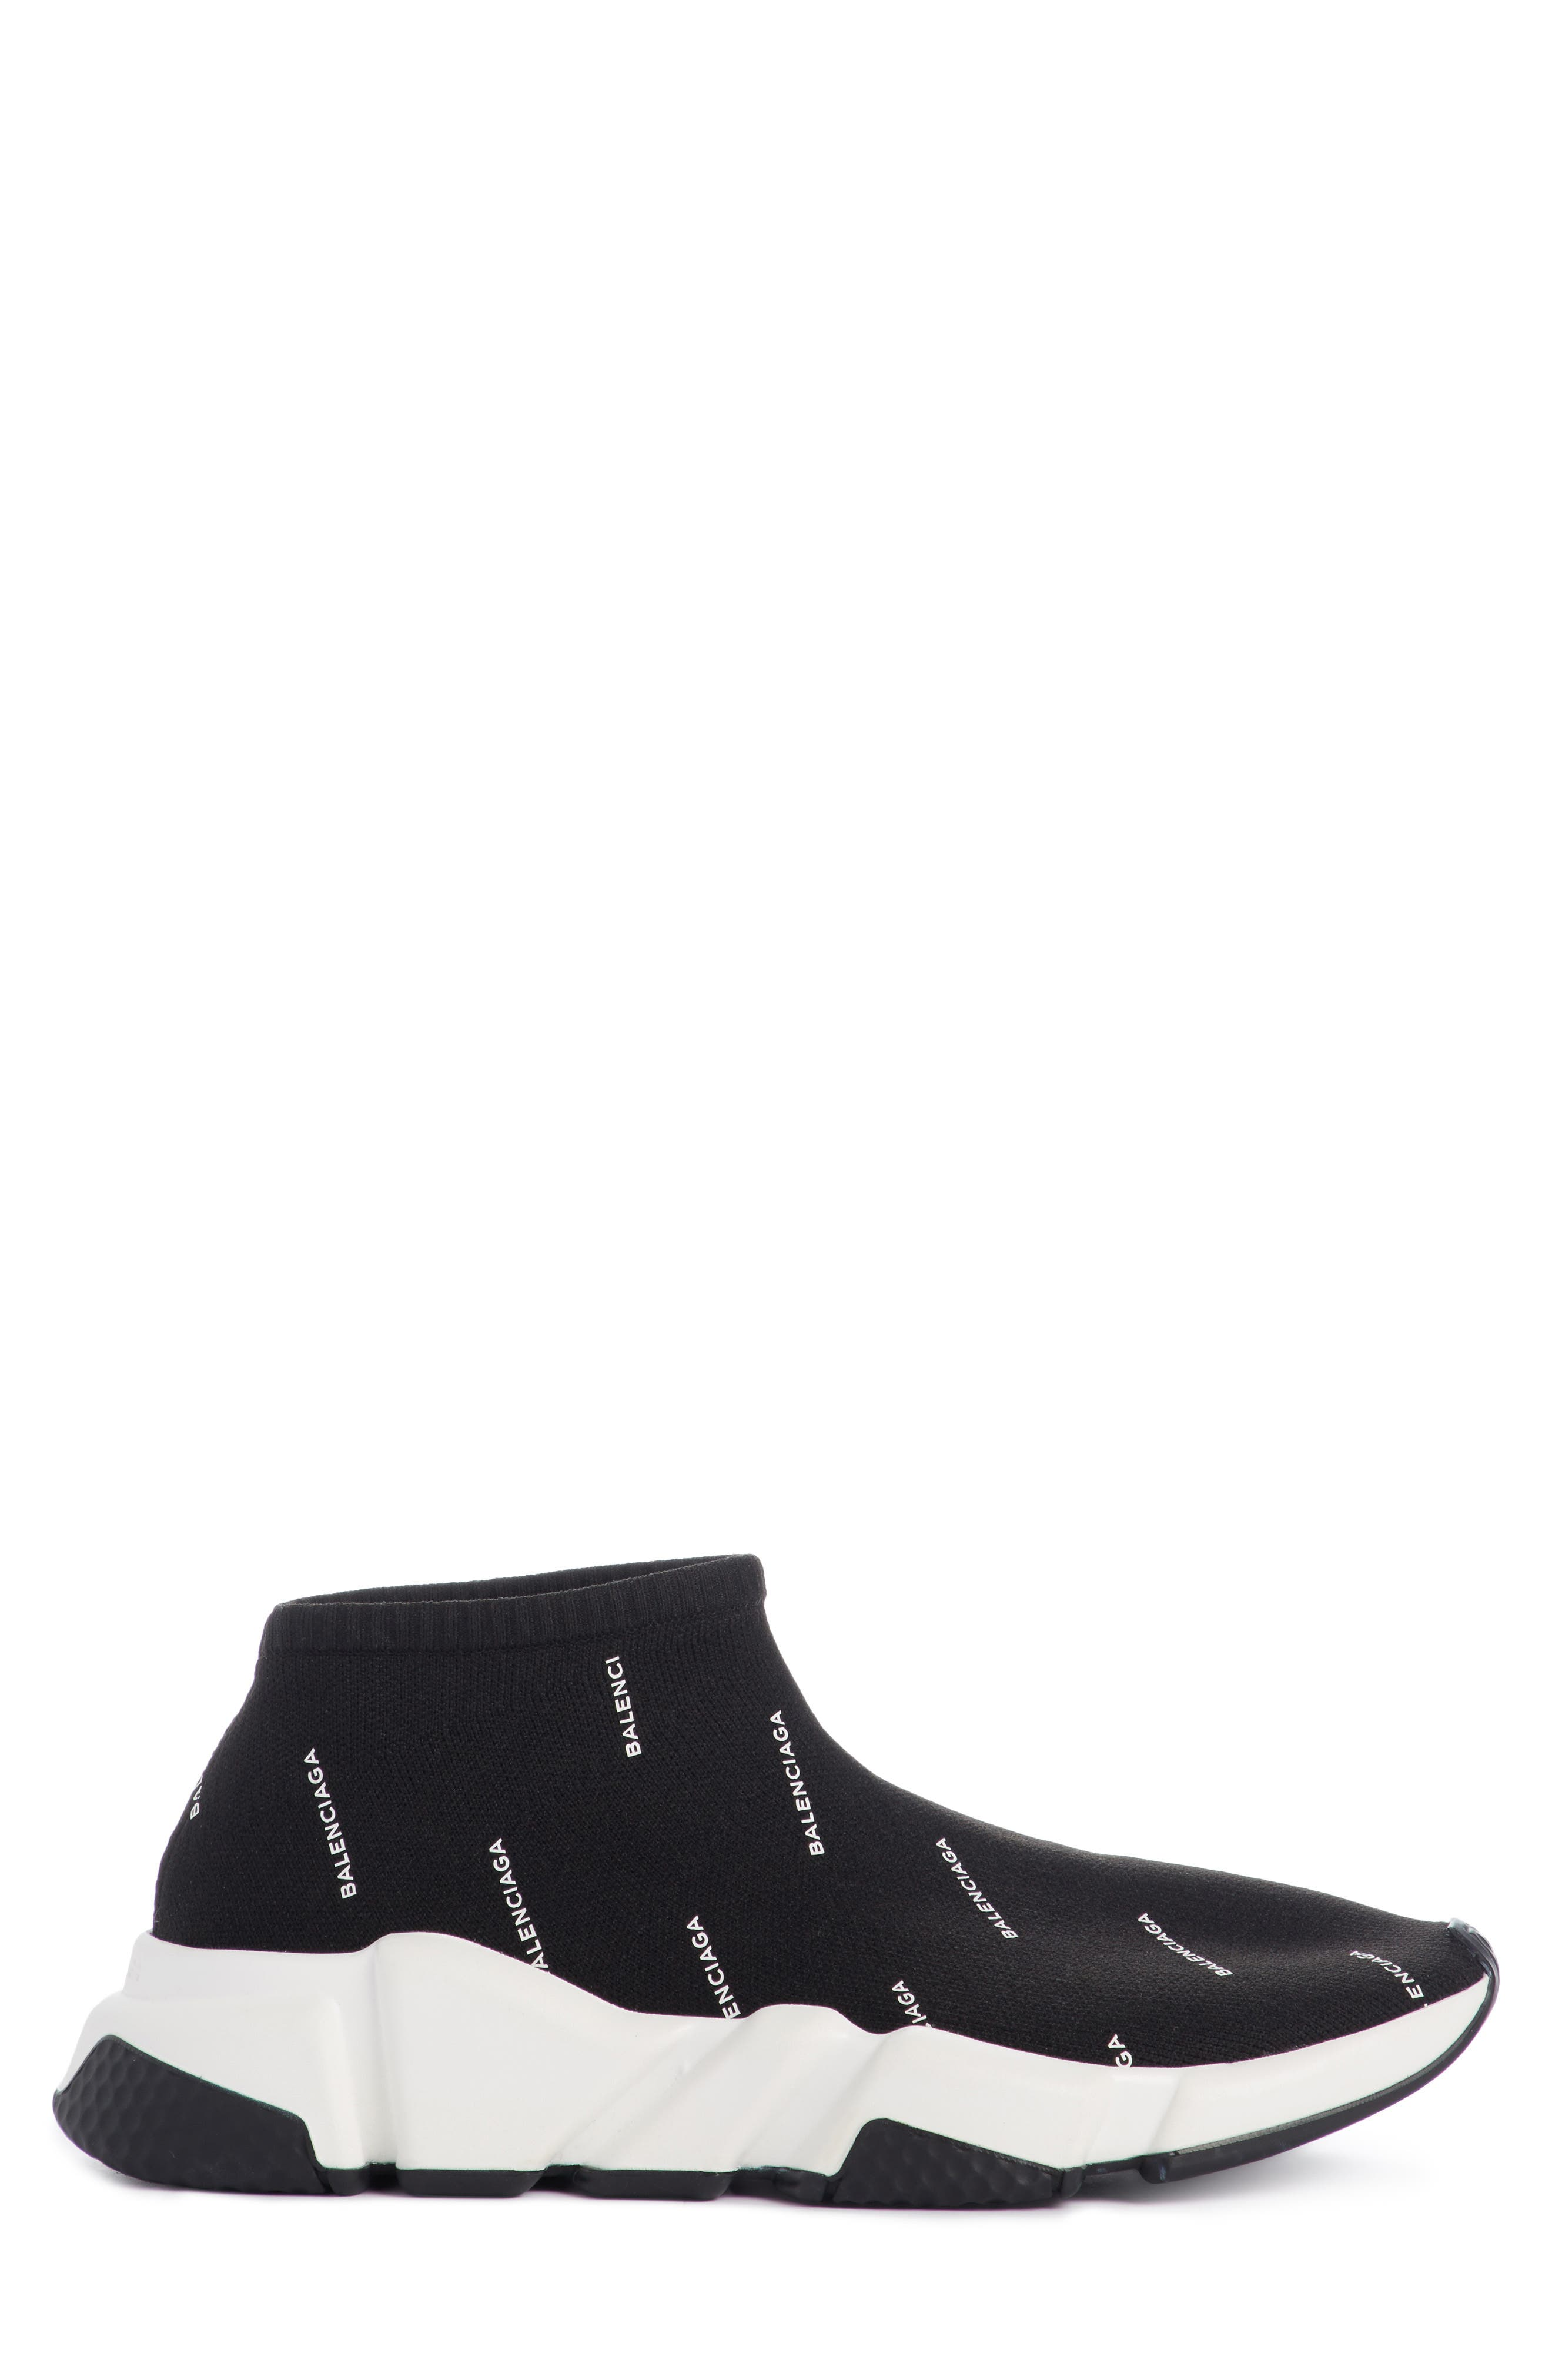 Low Speed Sneaker,                             Alternate thumbnail 4, color,                             Black/ White